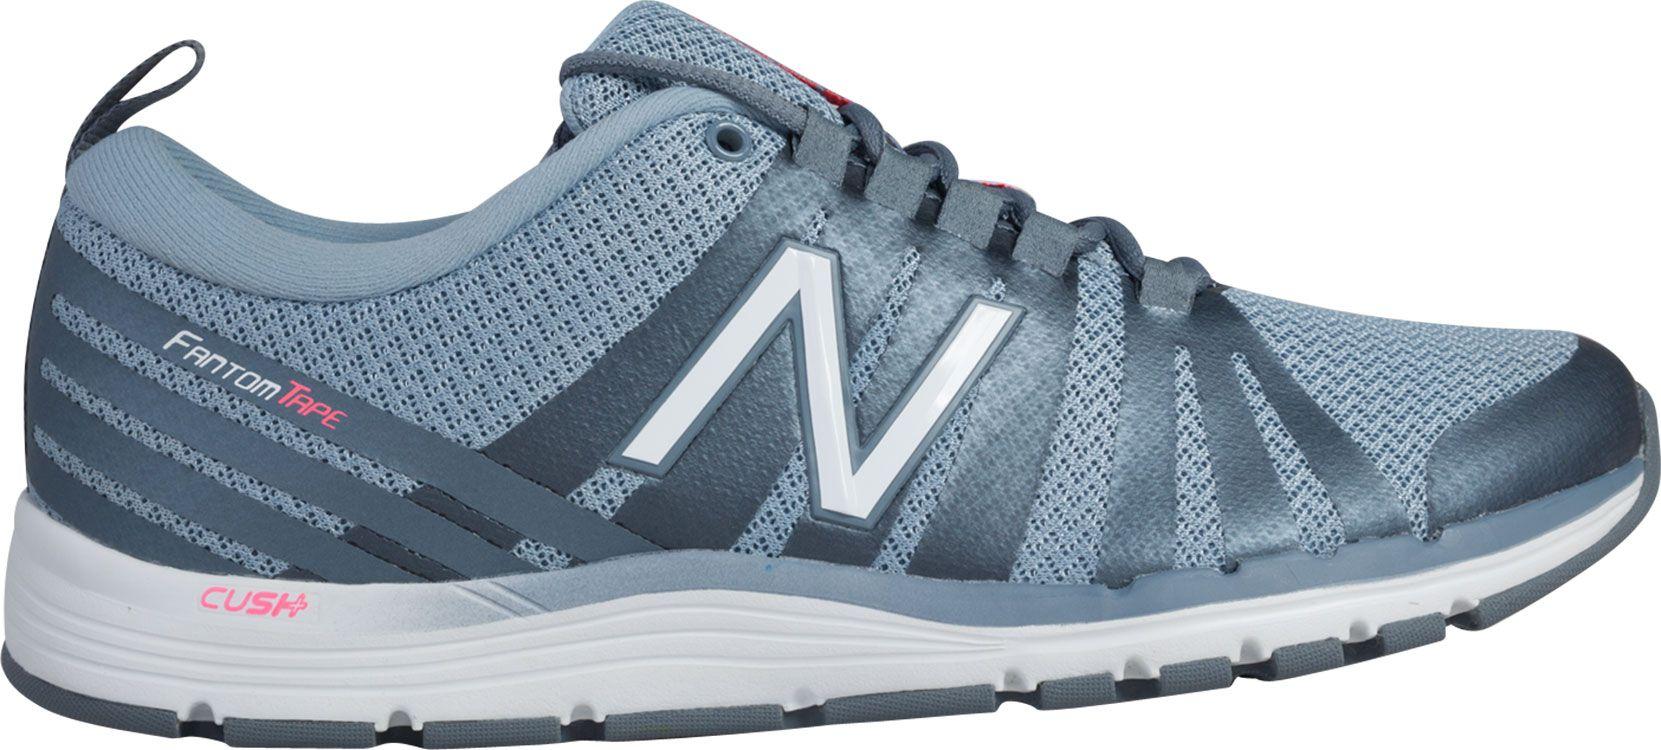 New Balance Women\u0027s 811 Training Shoes. 0:00. 0:00 / 0:00. noImageFound ???